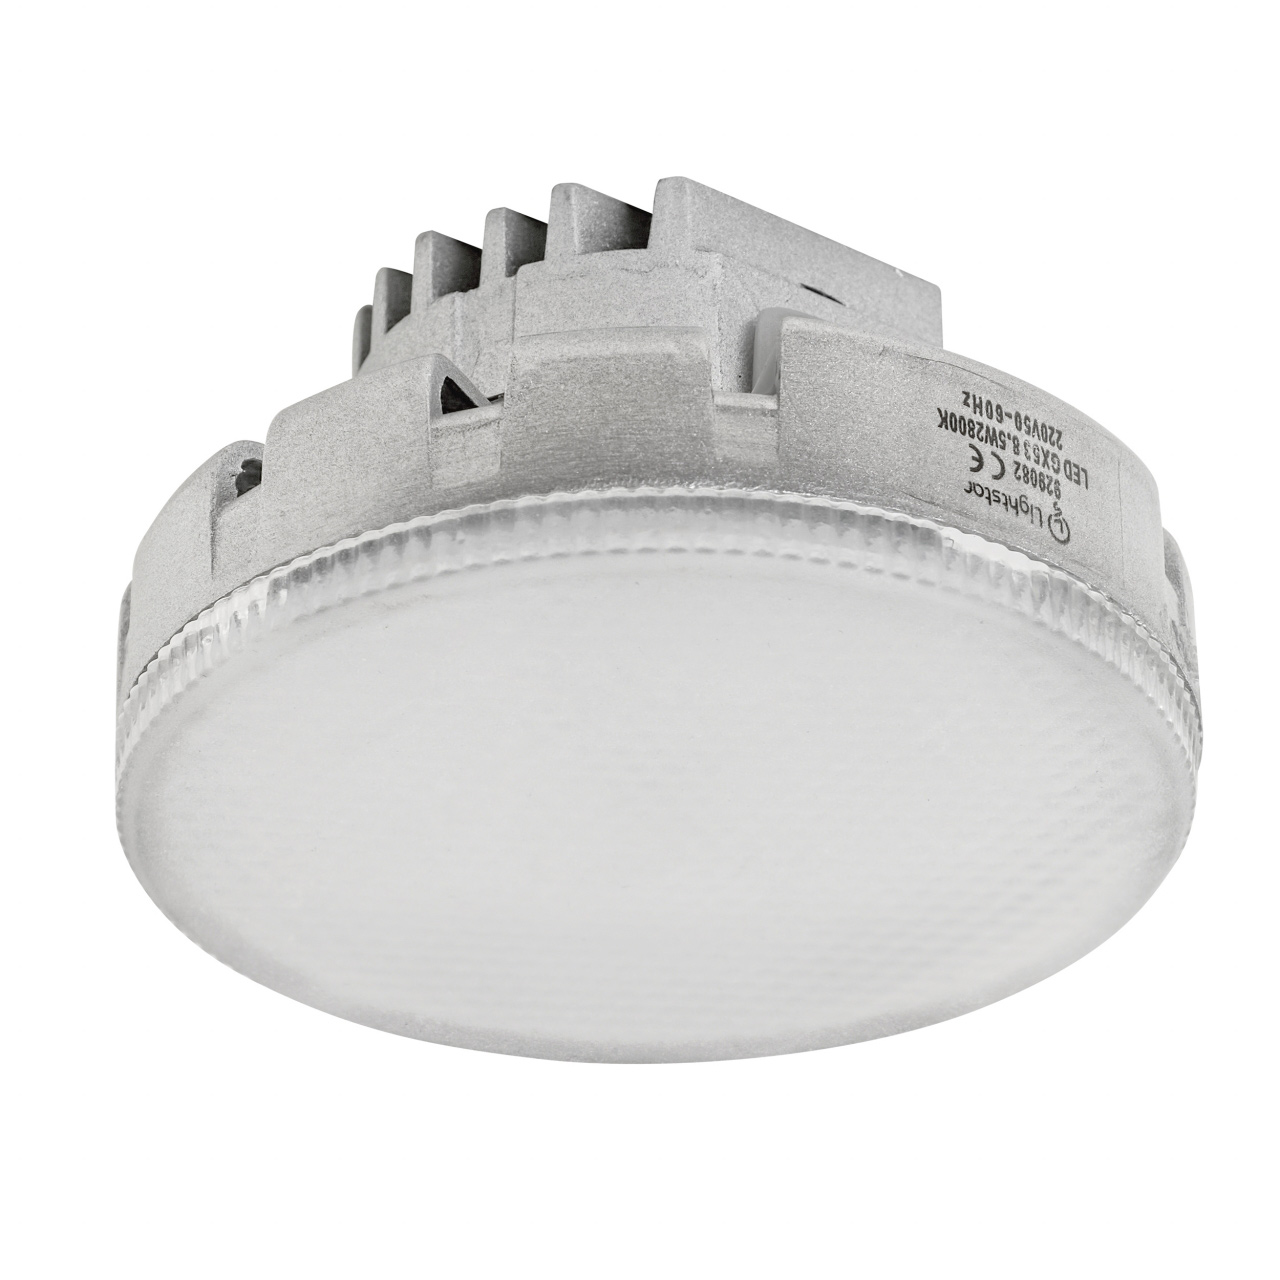 Лампа LED 220V TABL GX53 8.5W=80W 680LM 180G FR 4000K 20000H Lightstar 929084